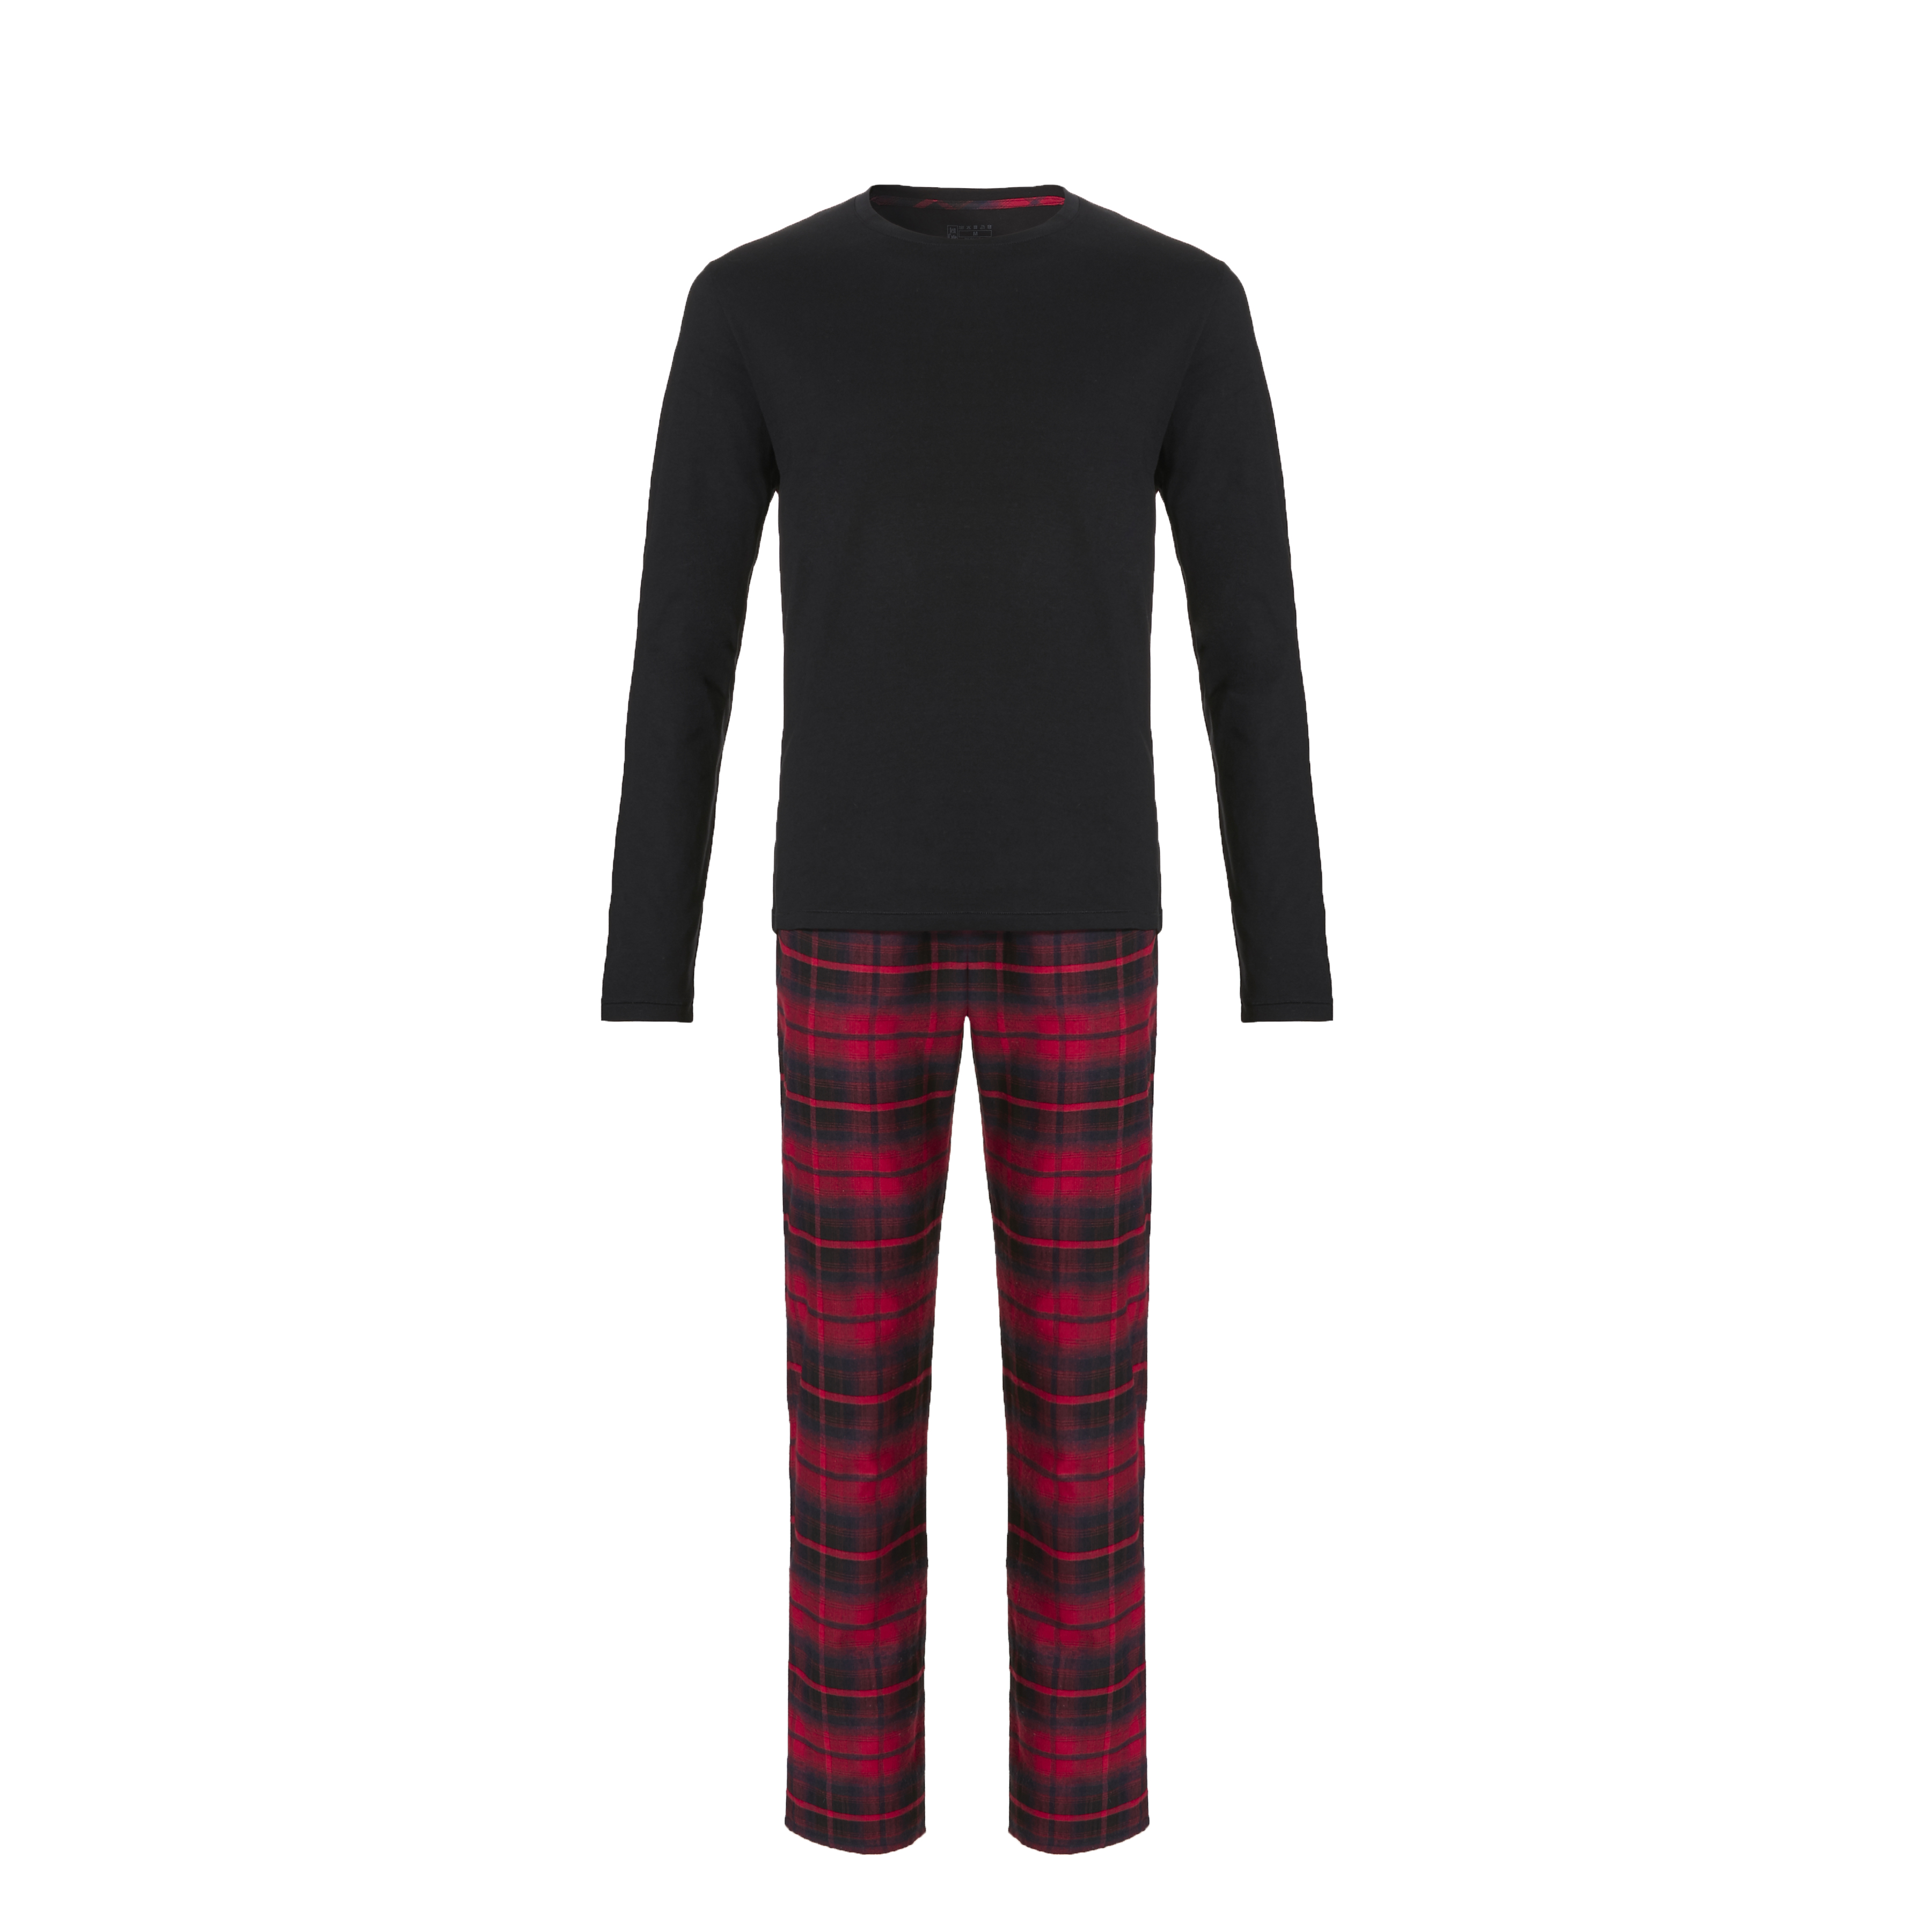 Ten Cate Men Pyjama Black/Red